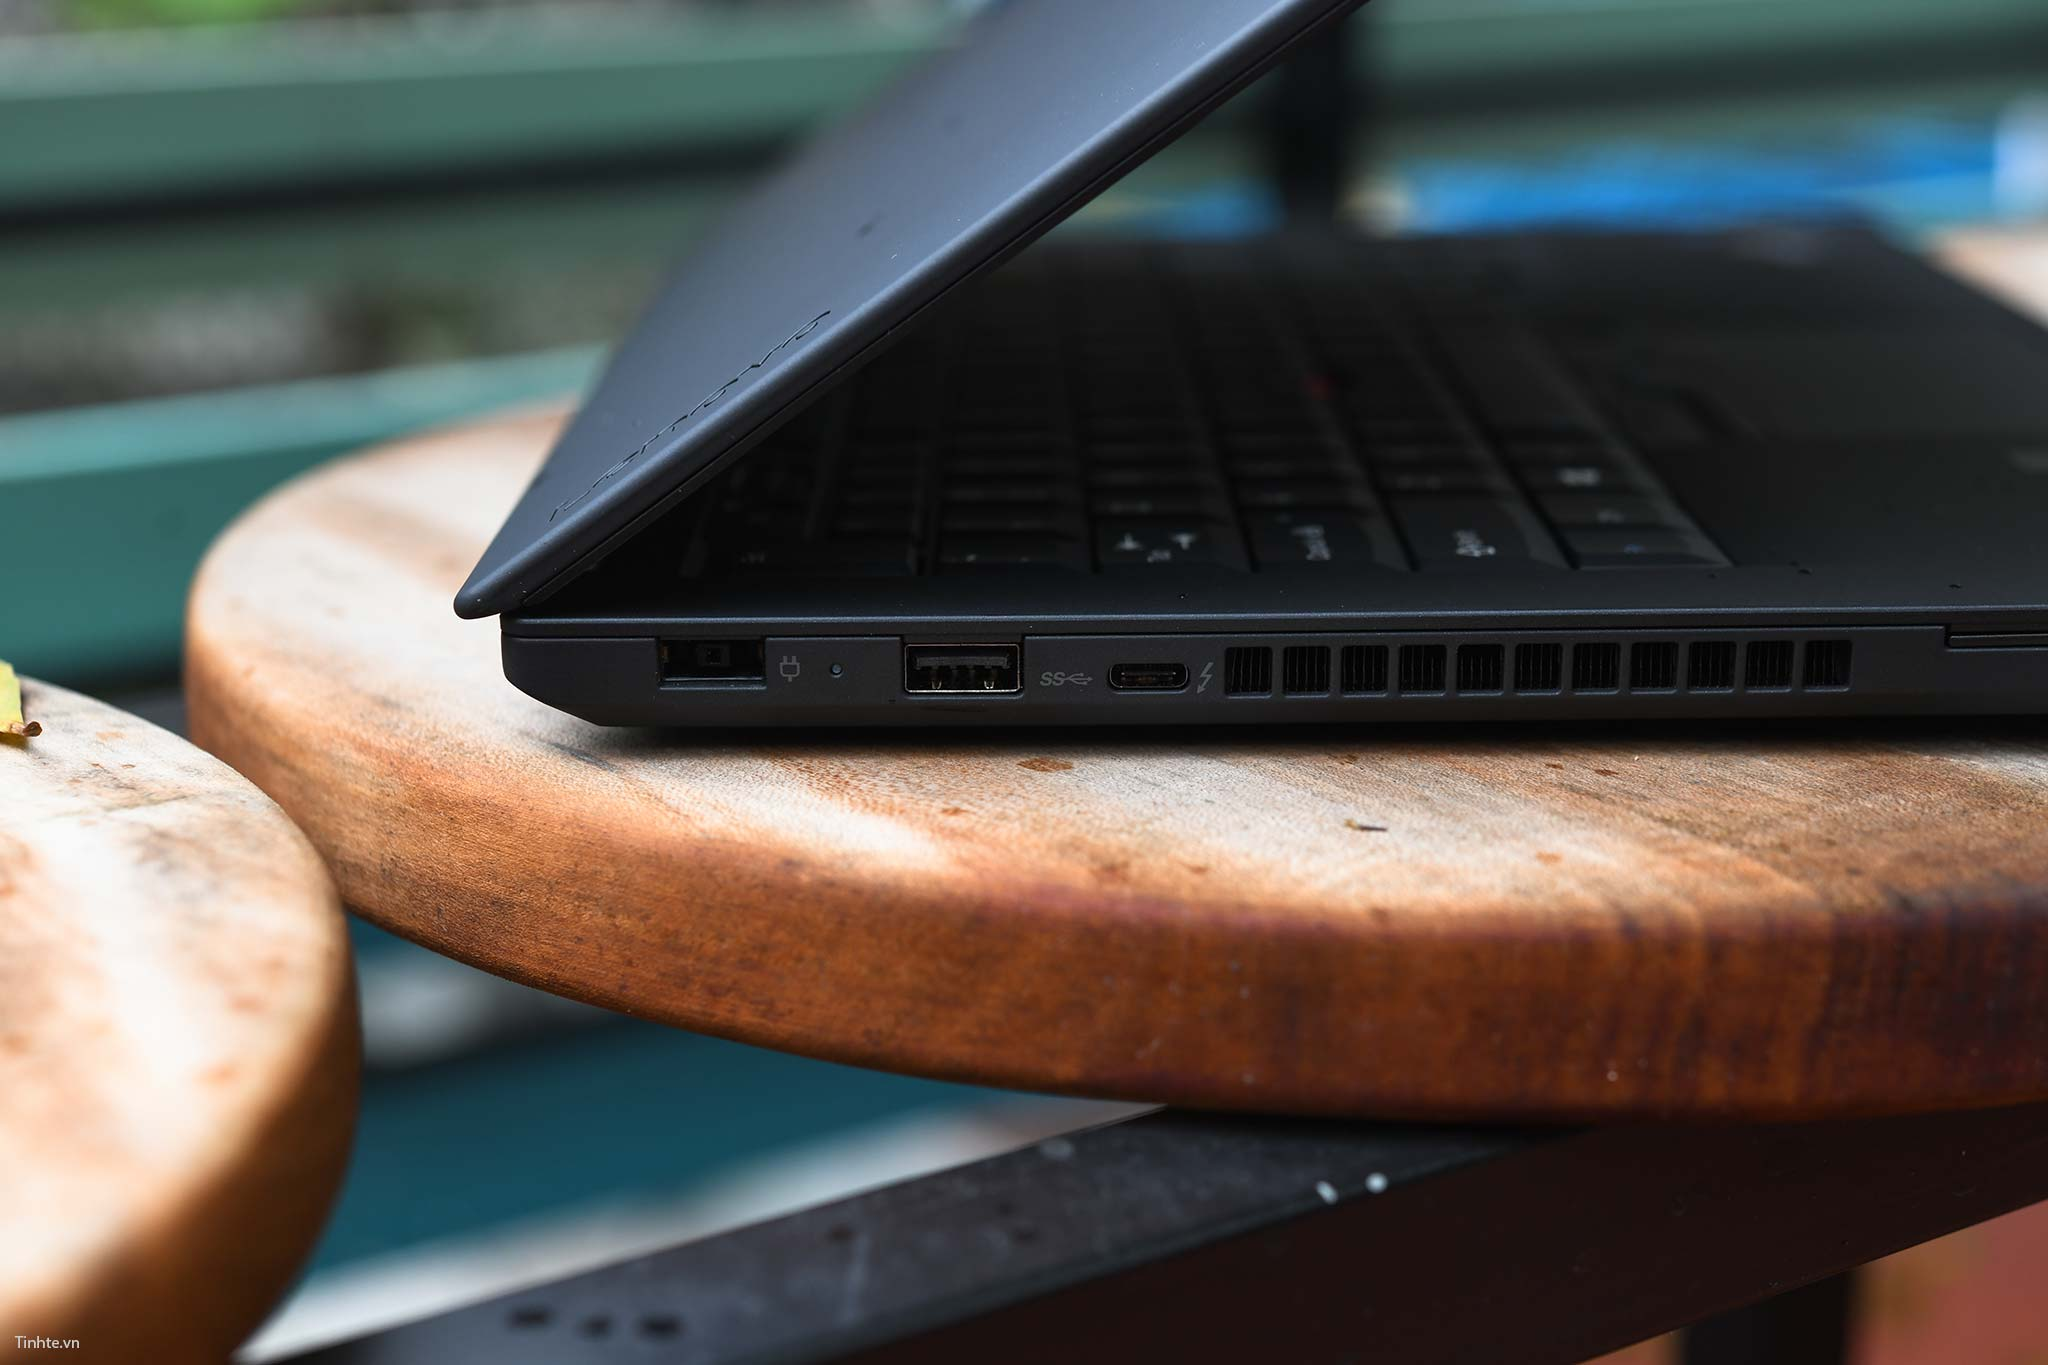 ThinkPad 25_tinhte.vn 18.jpg